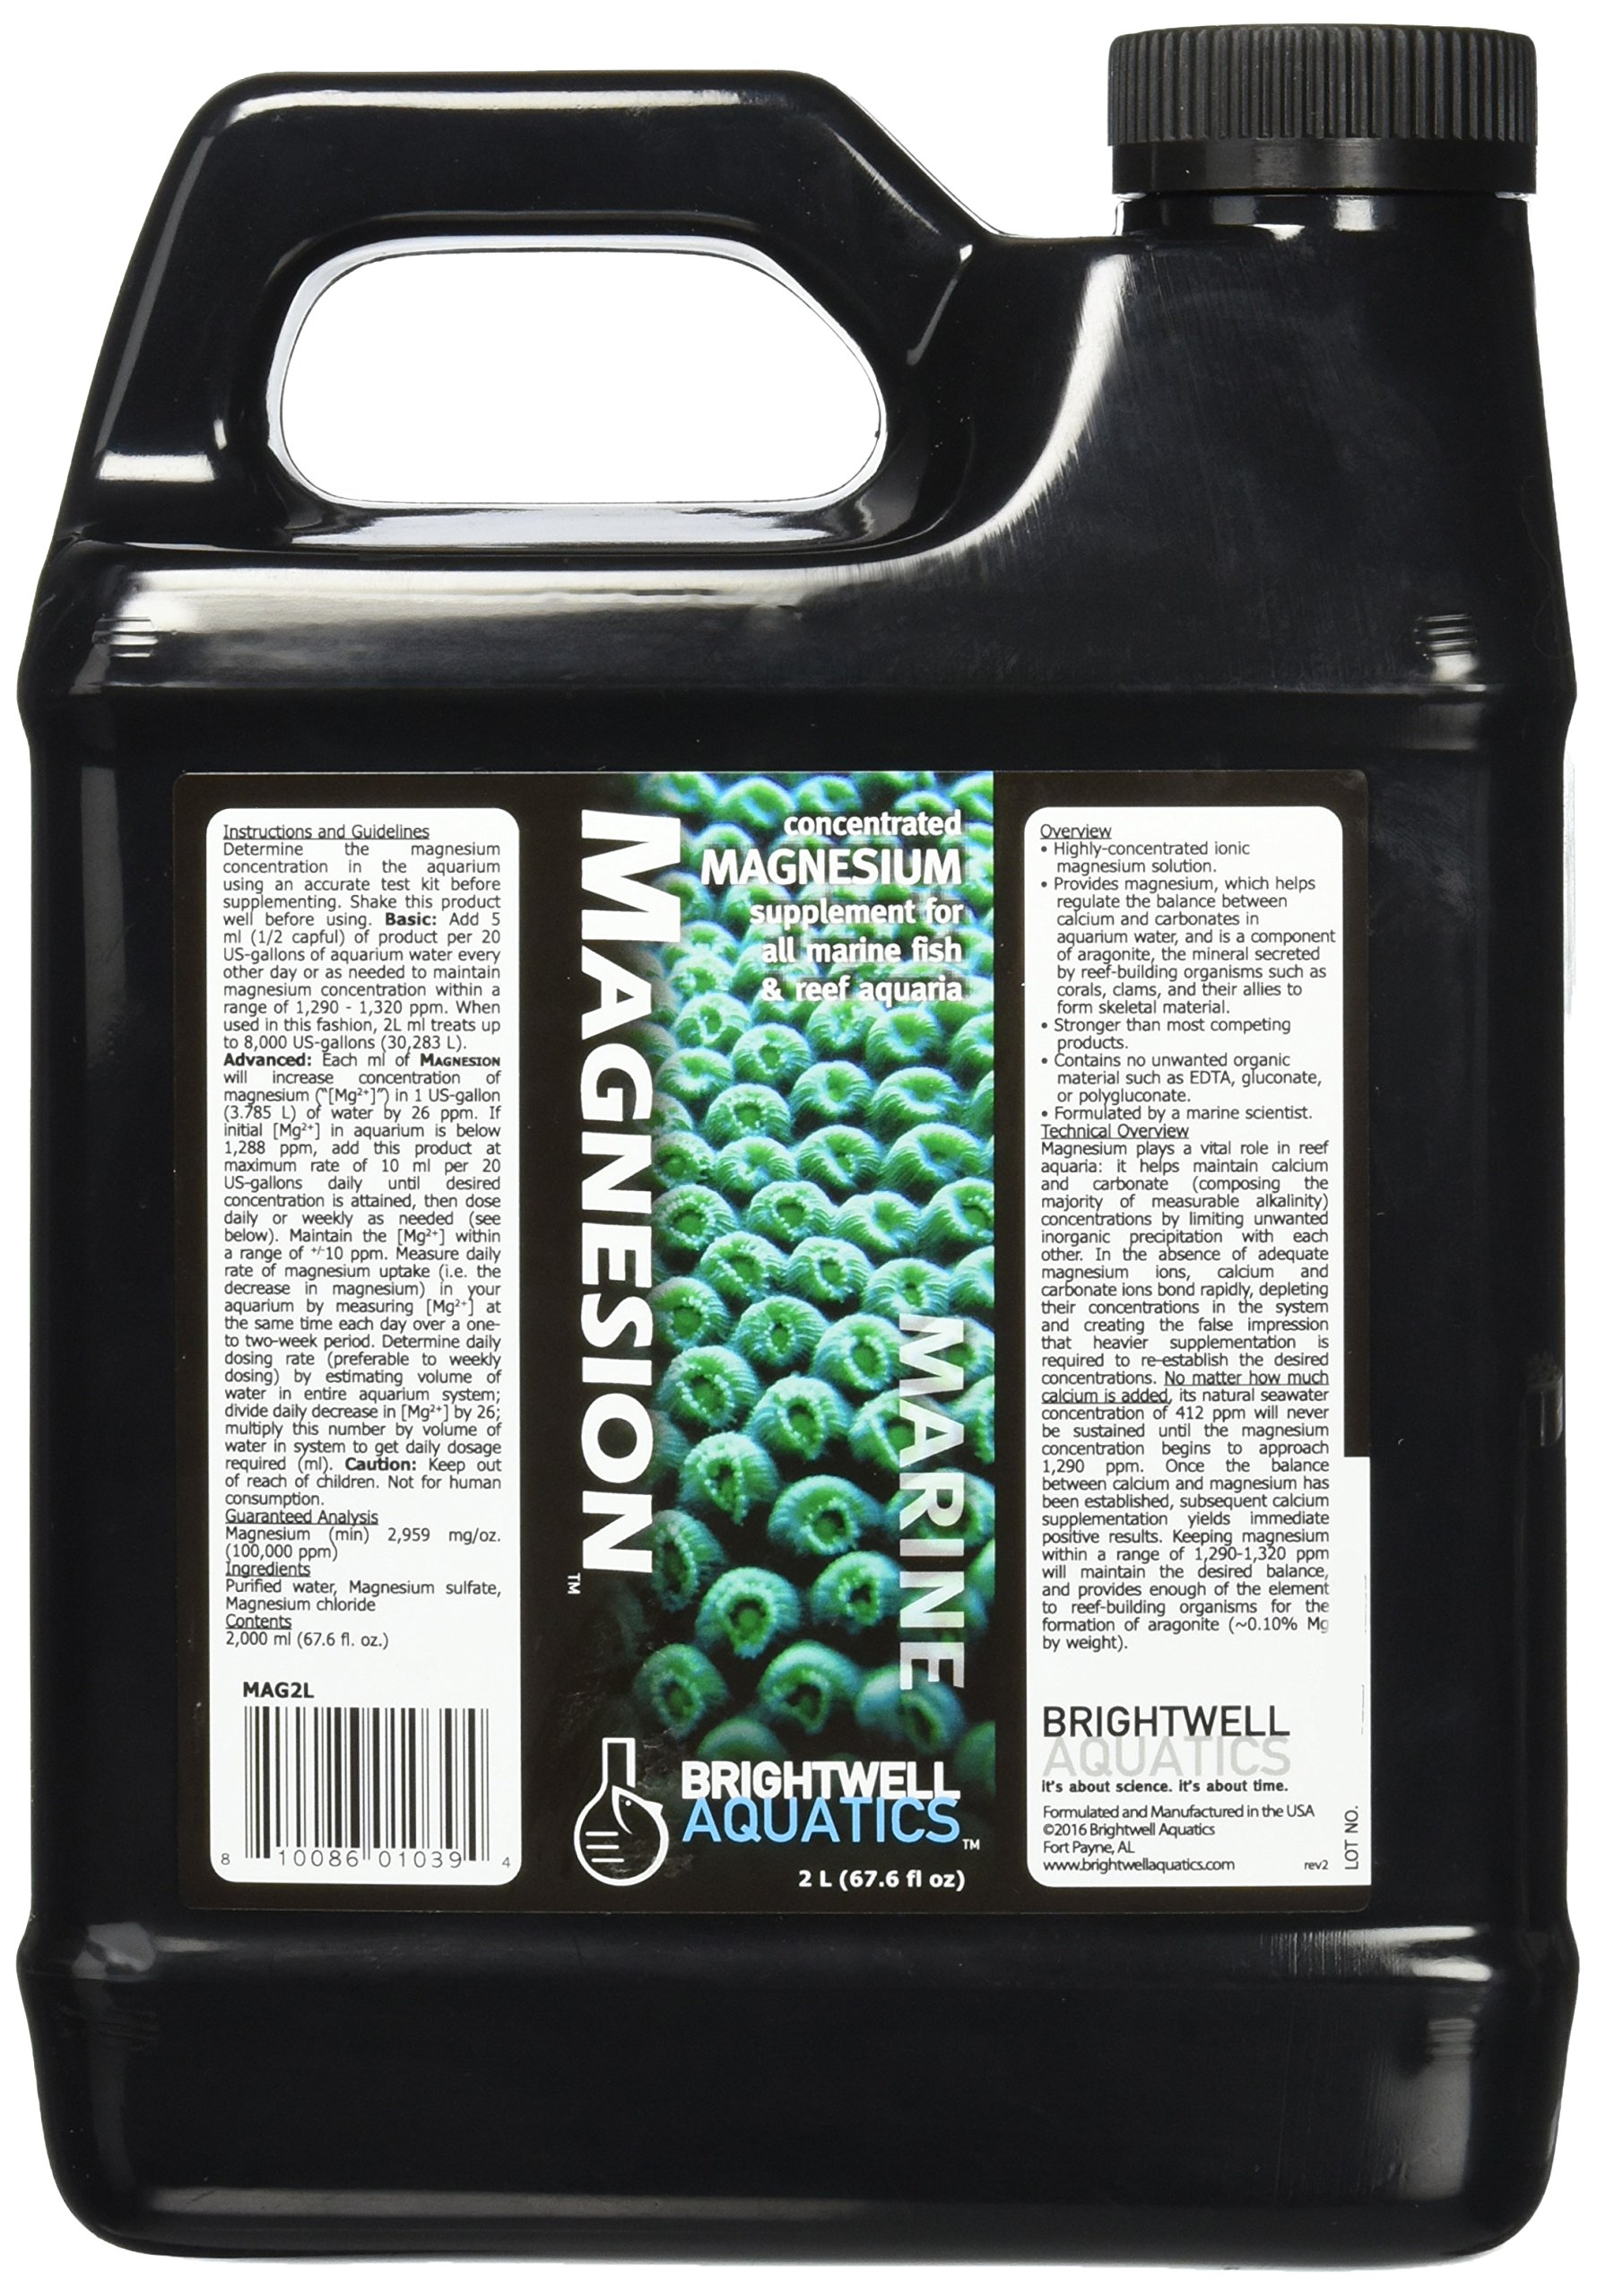 Brightwell Aquatics ABAMAG2L Magnesion Liquid Salt Water Conditioners for Aquarium, 67-Ounce